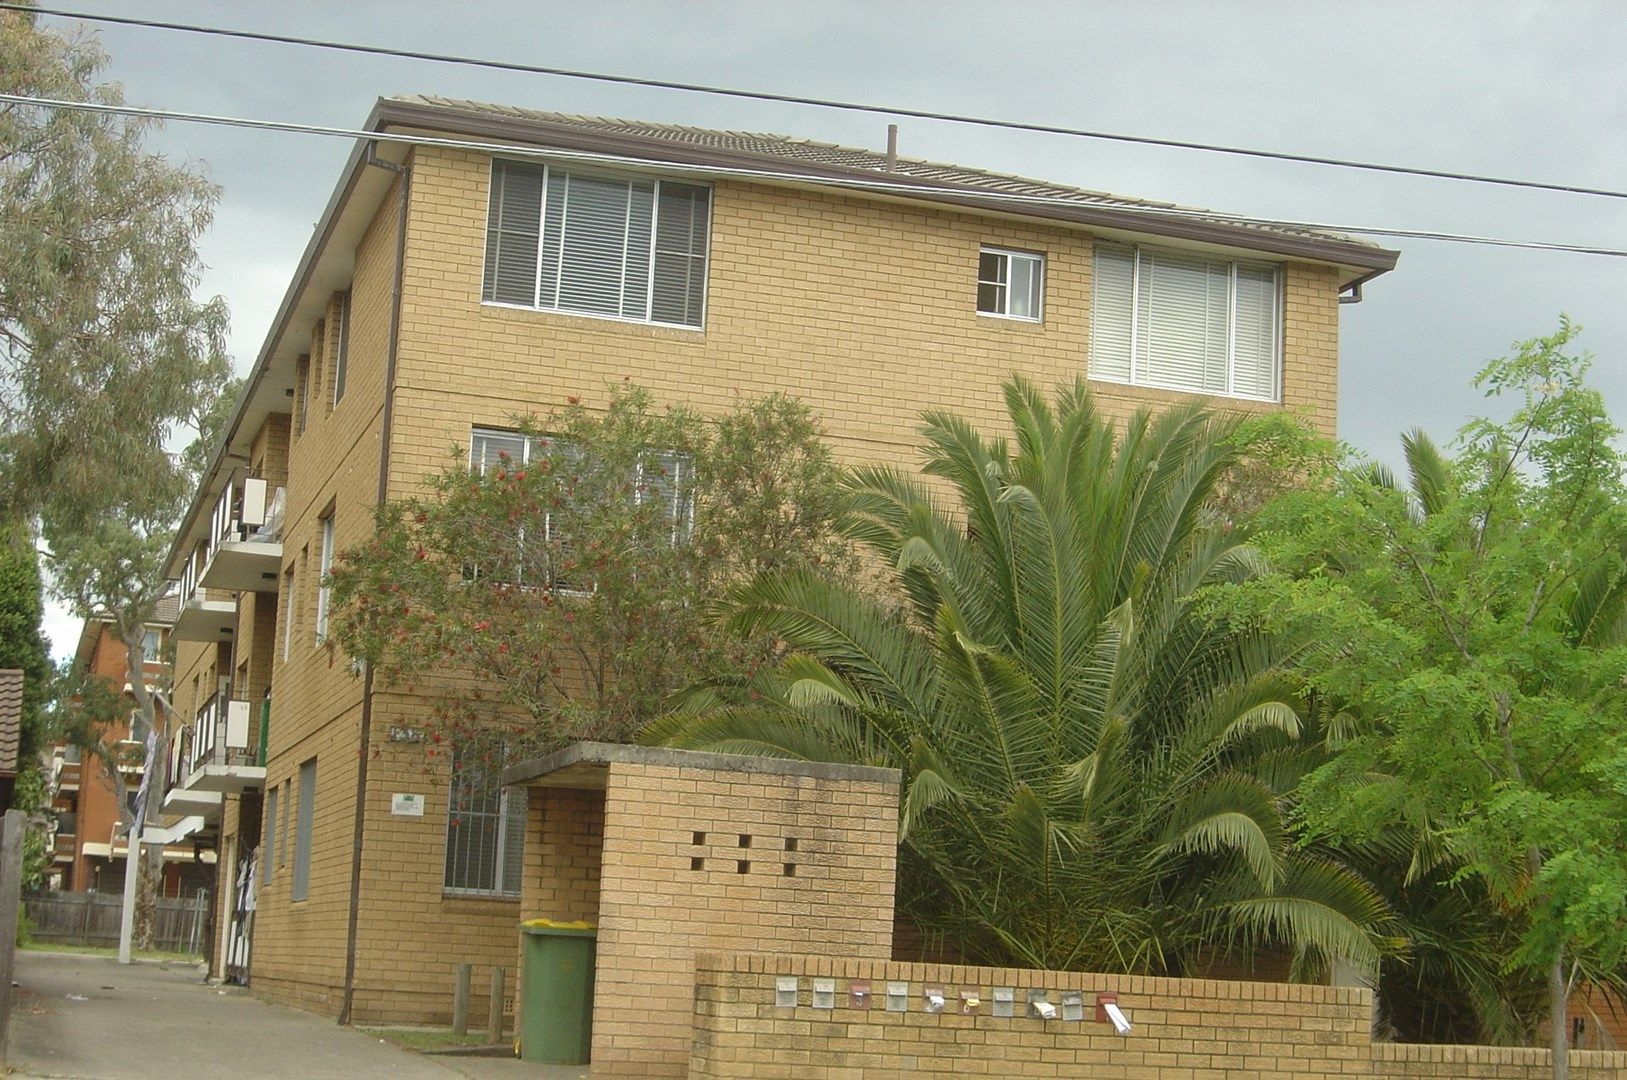 5/138 LONGFIELD, Cabramatta NSW 2166, Image 0